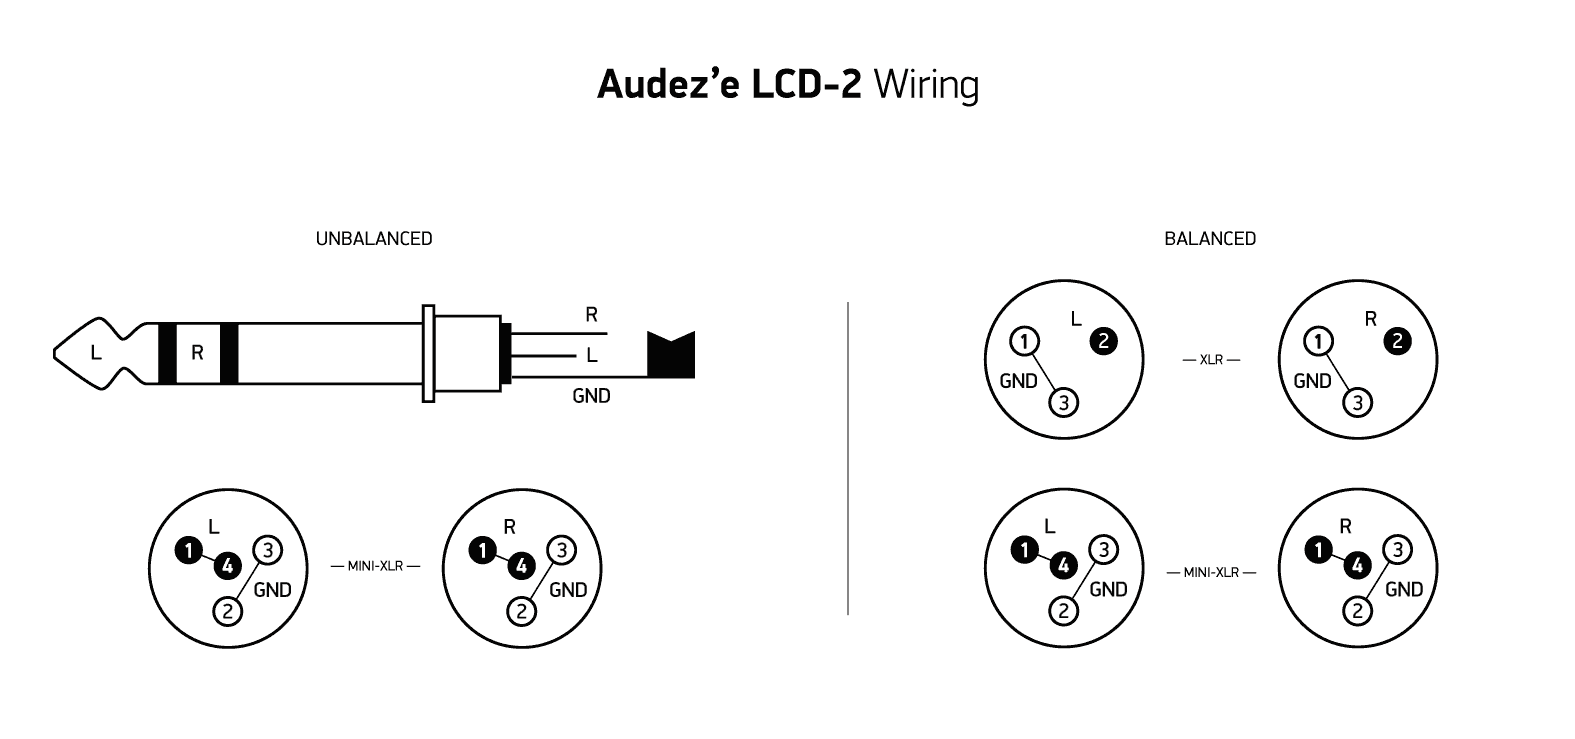 trs jack wiring diagram cessna 172 alternator diy audio electronics from zynsonix.com: november 2011